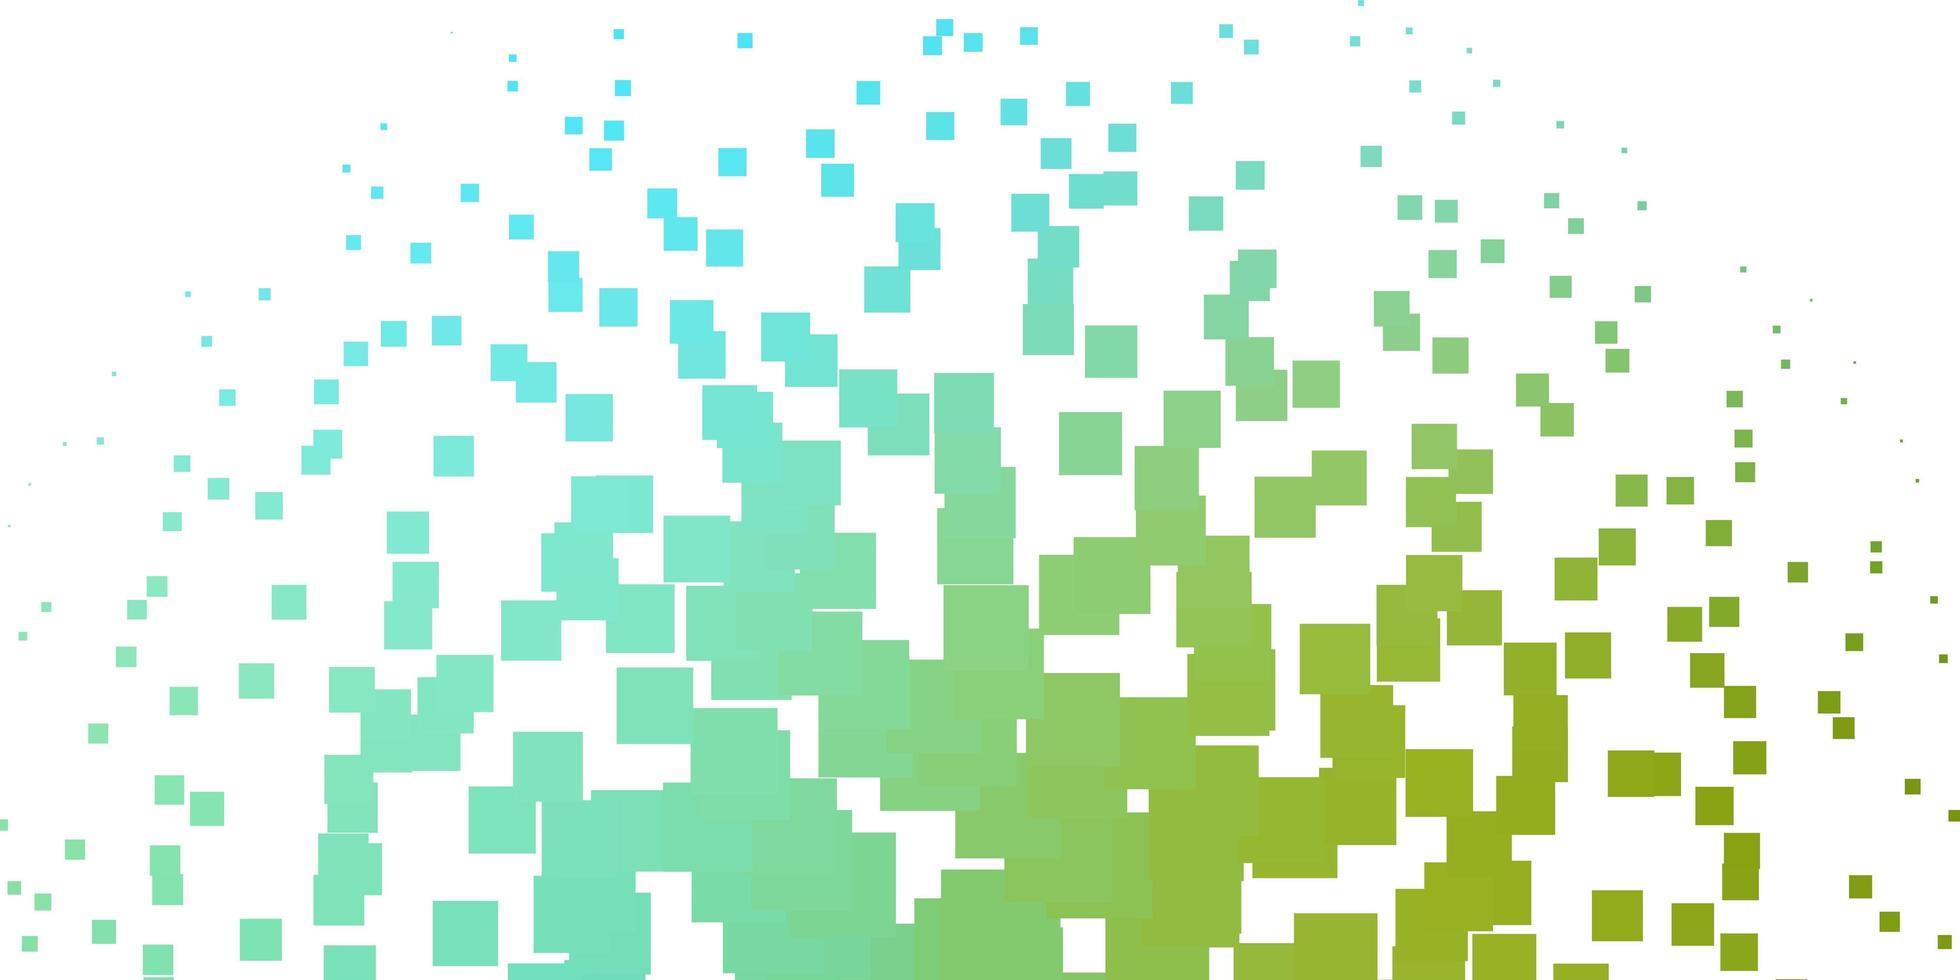 hellblaues, grünes Vektormuster im quadratischen Stil. vektor